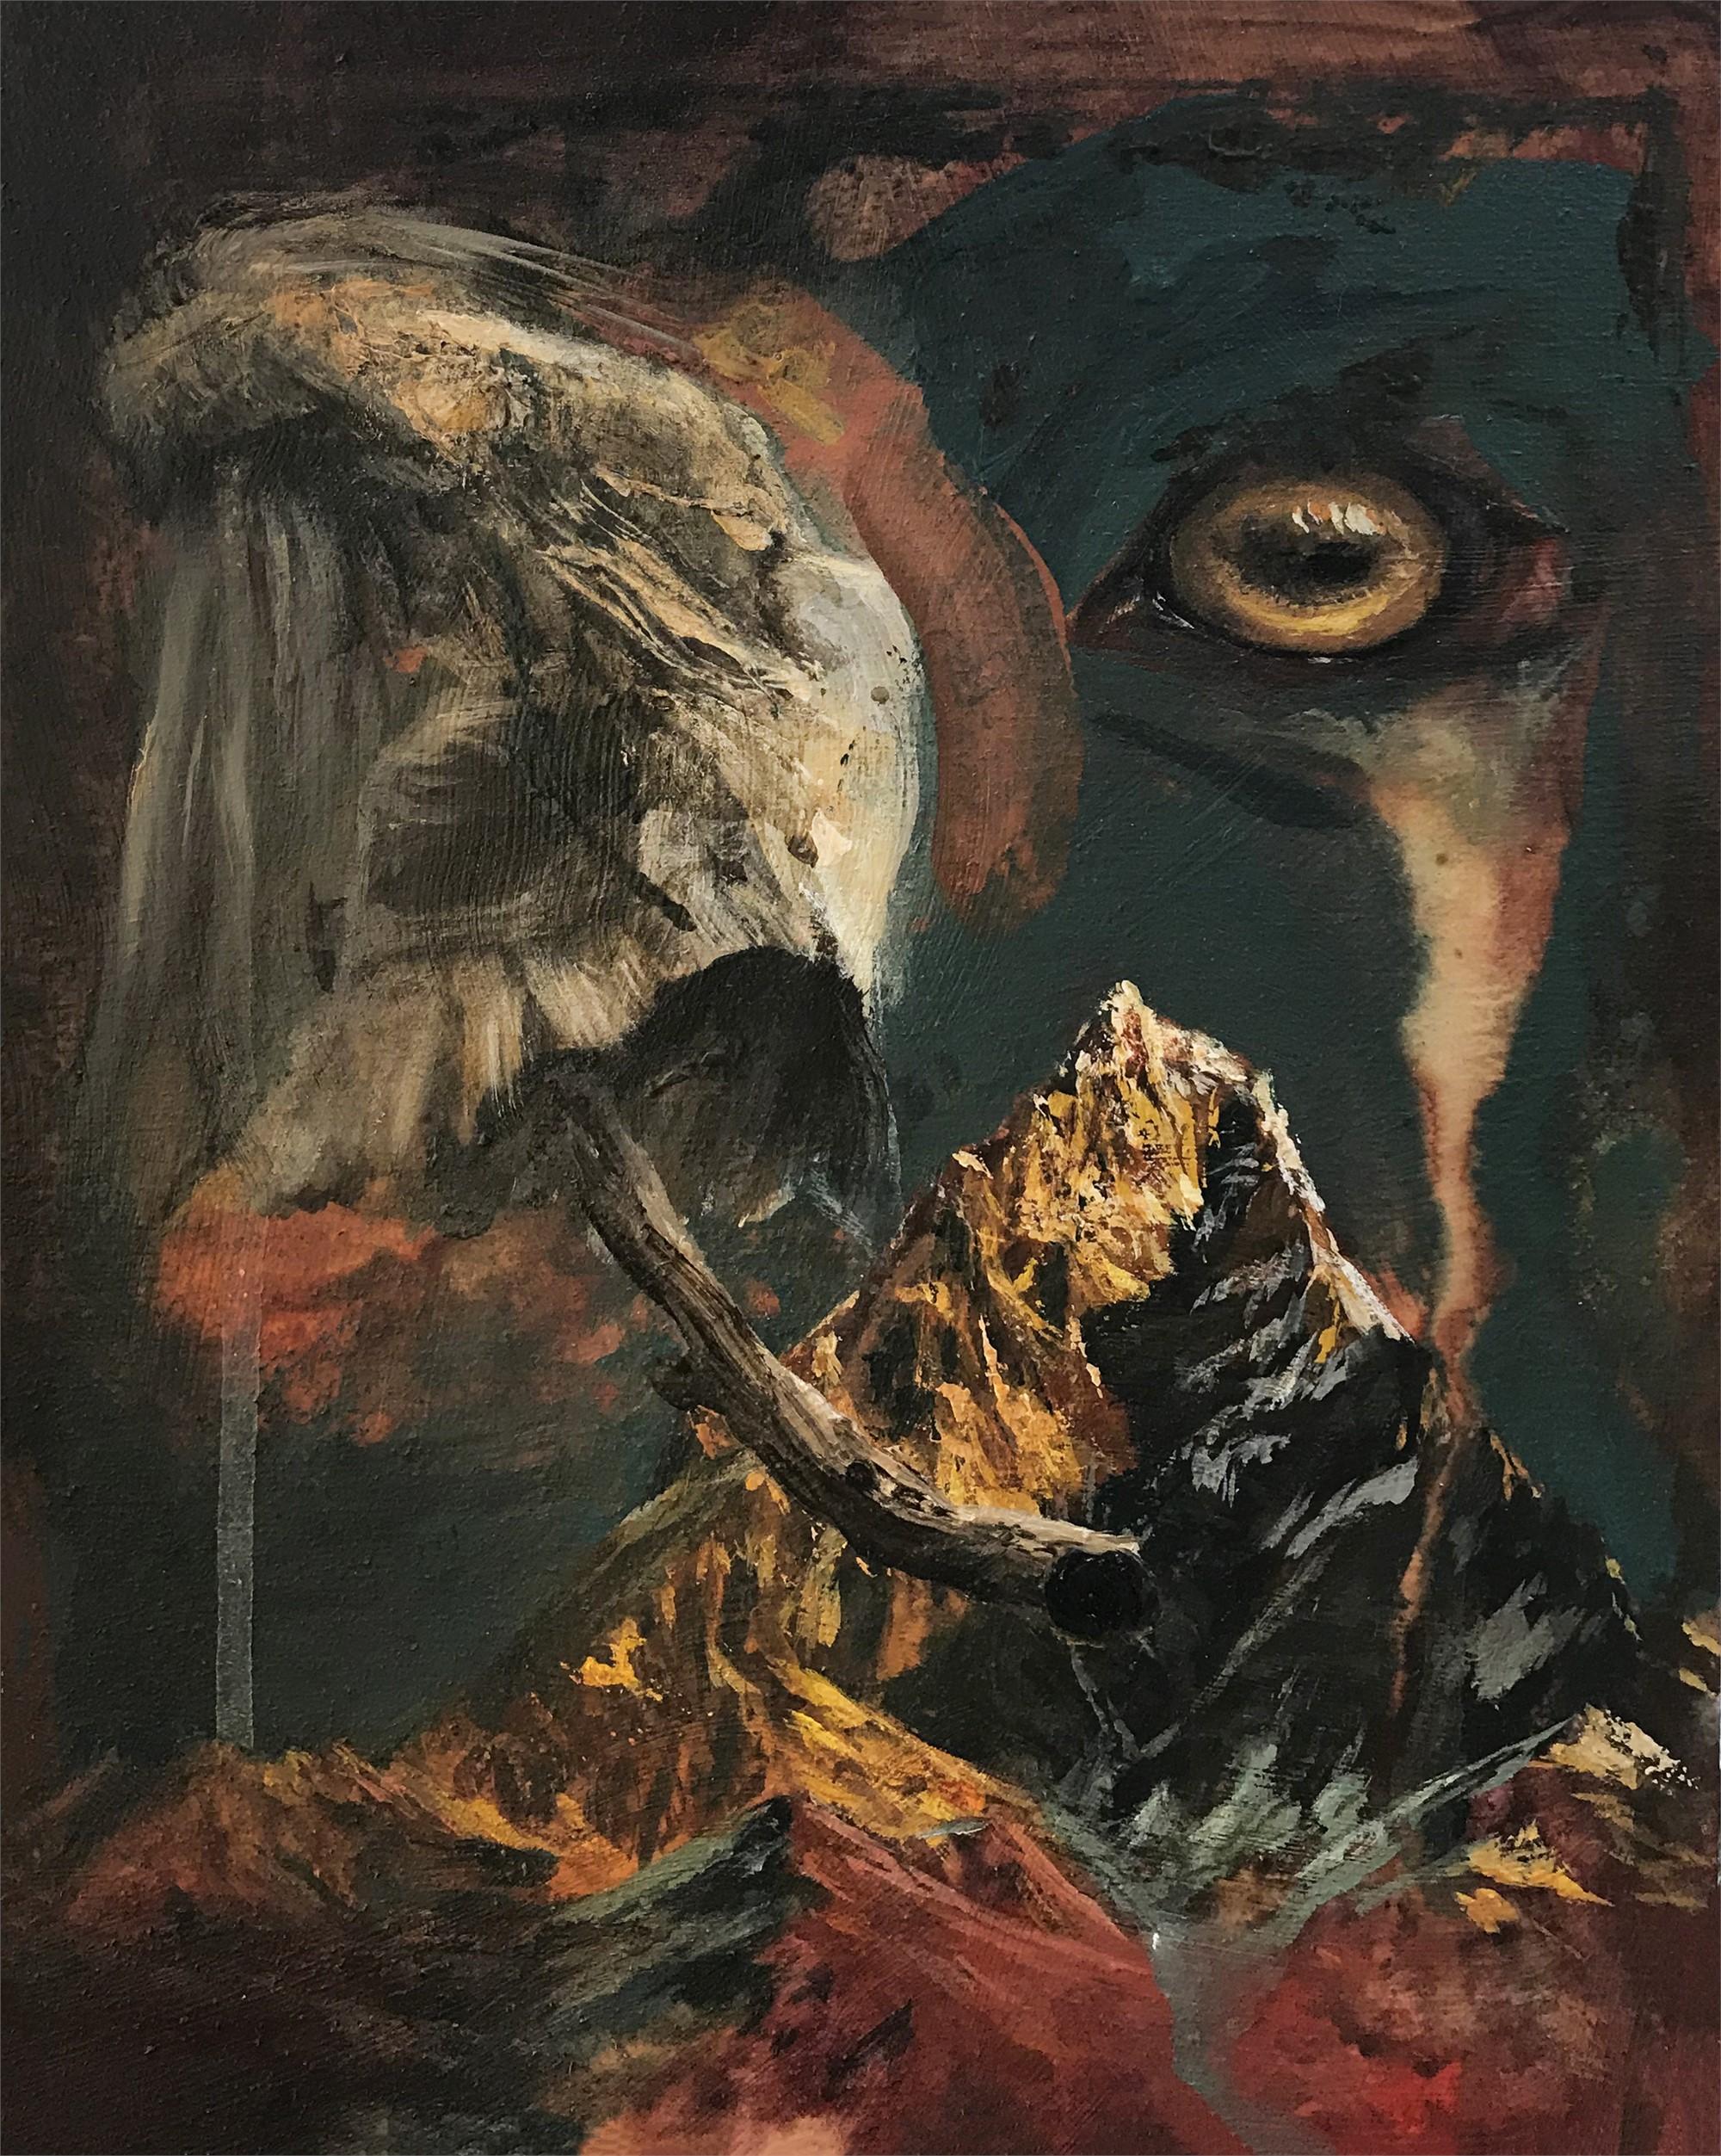 Capra Mons by Adam Burke